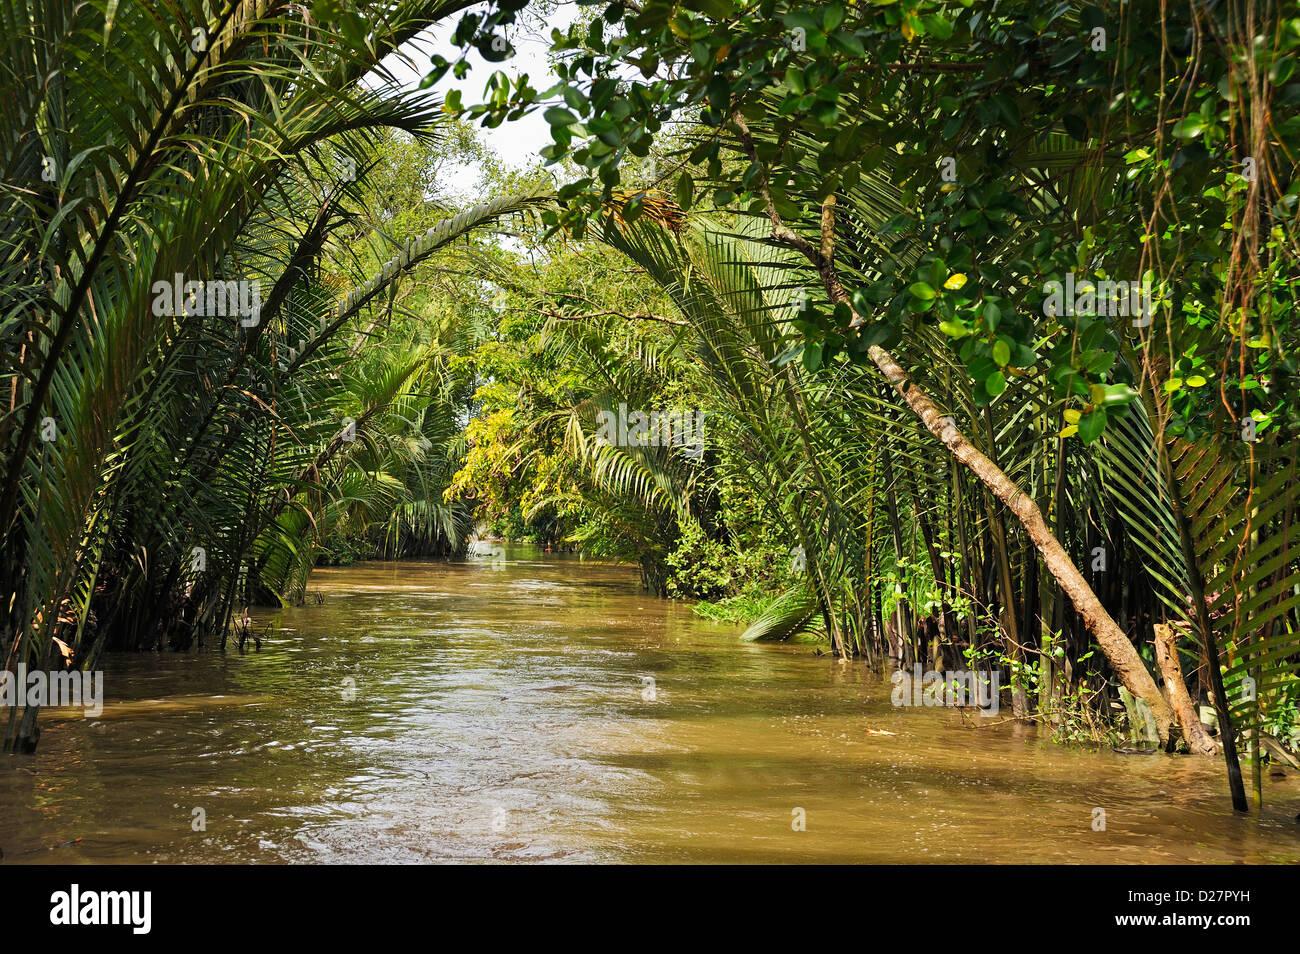 Mekong River, Vietnam - Stock Image